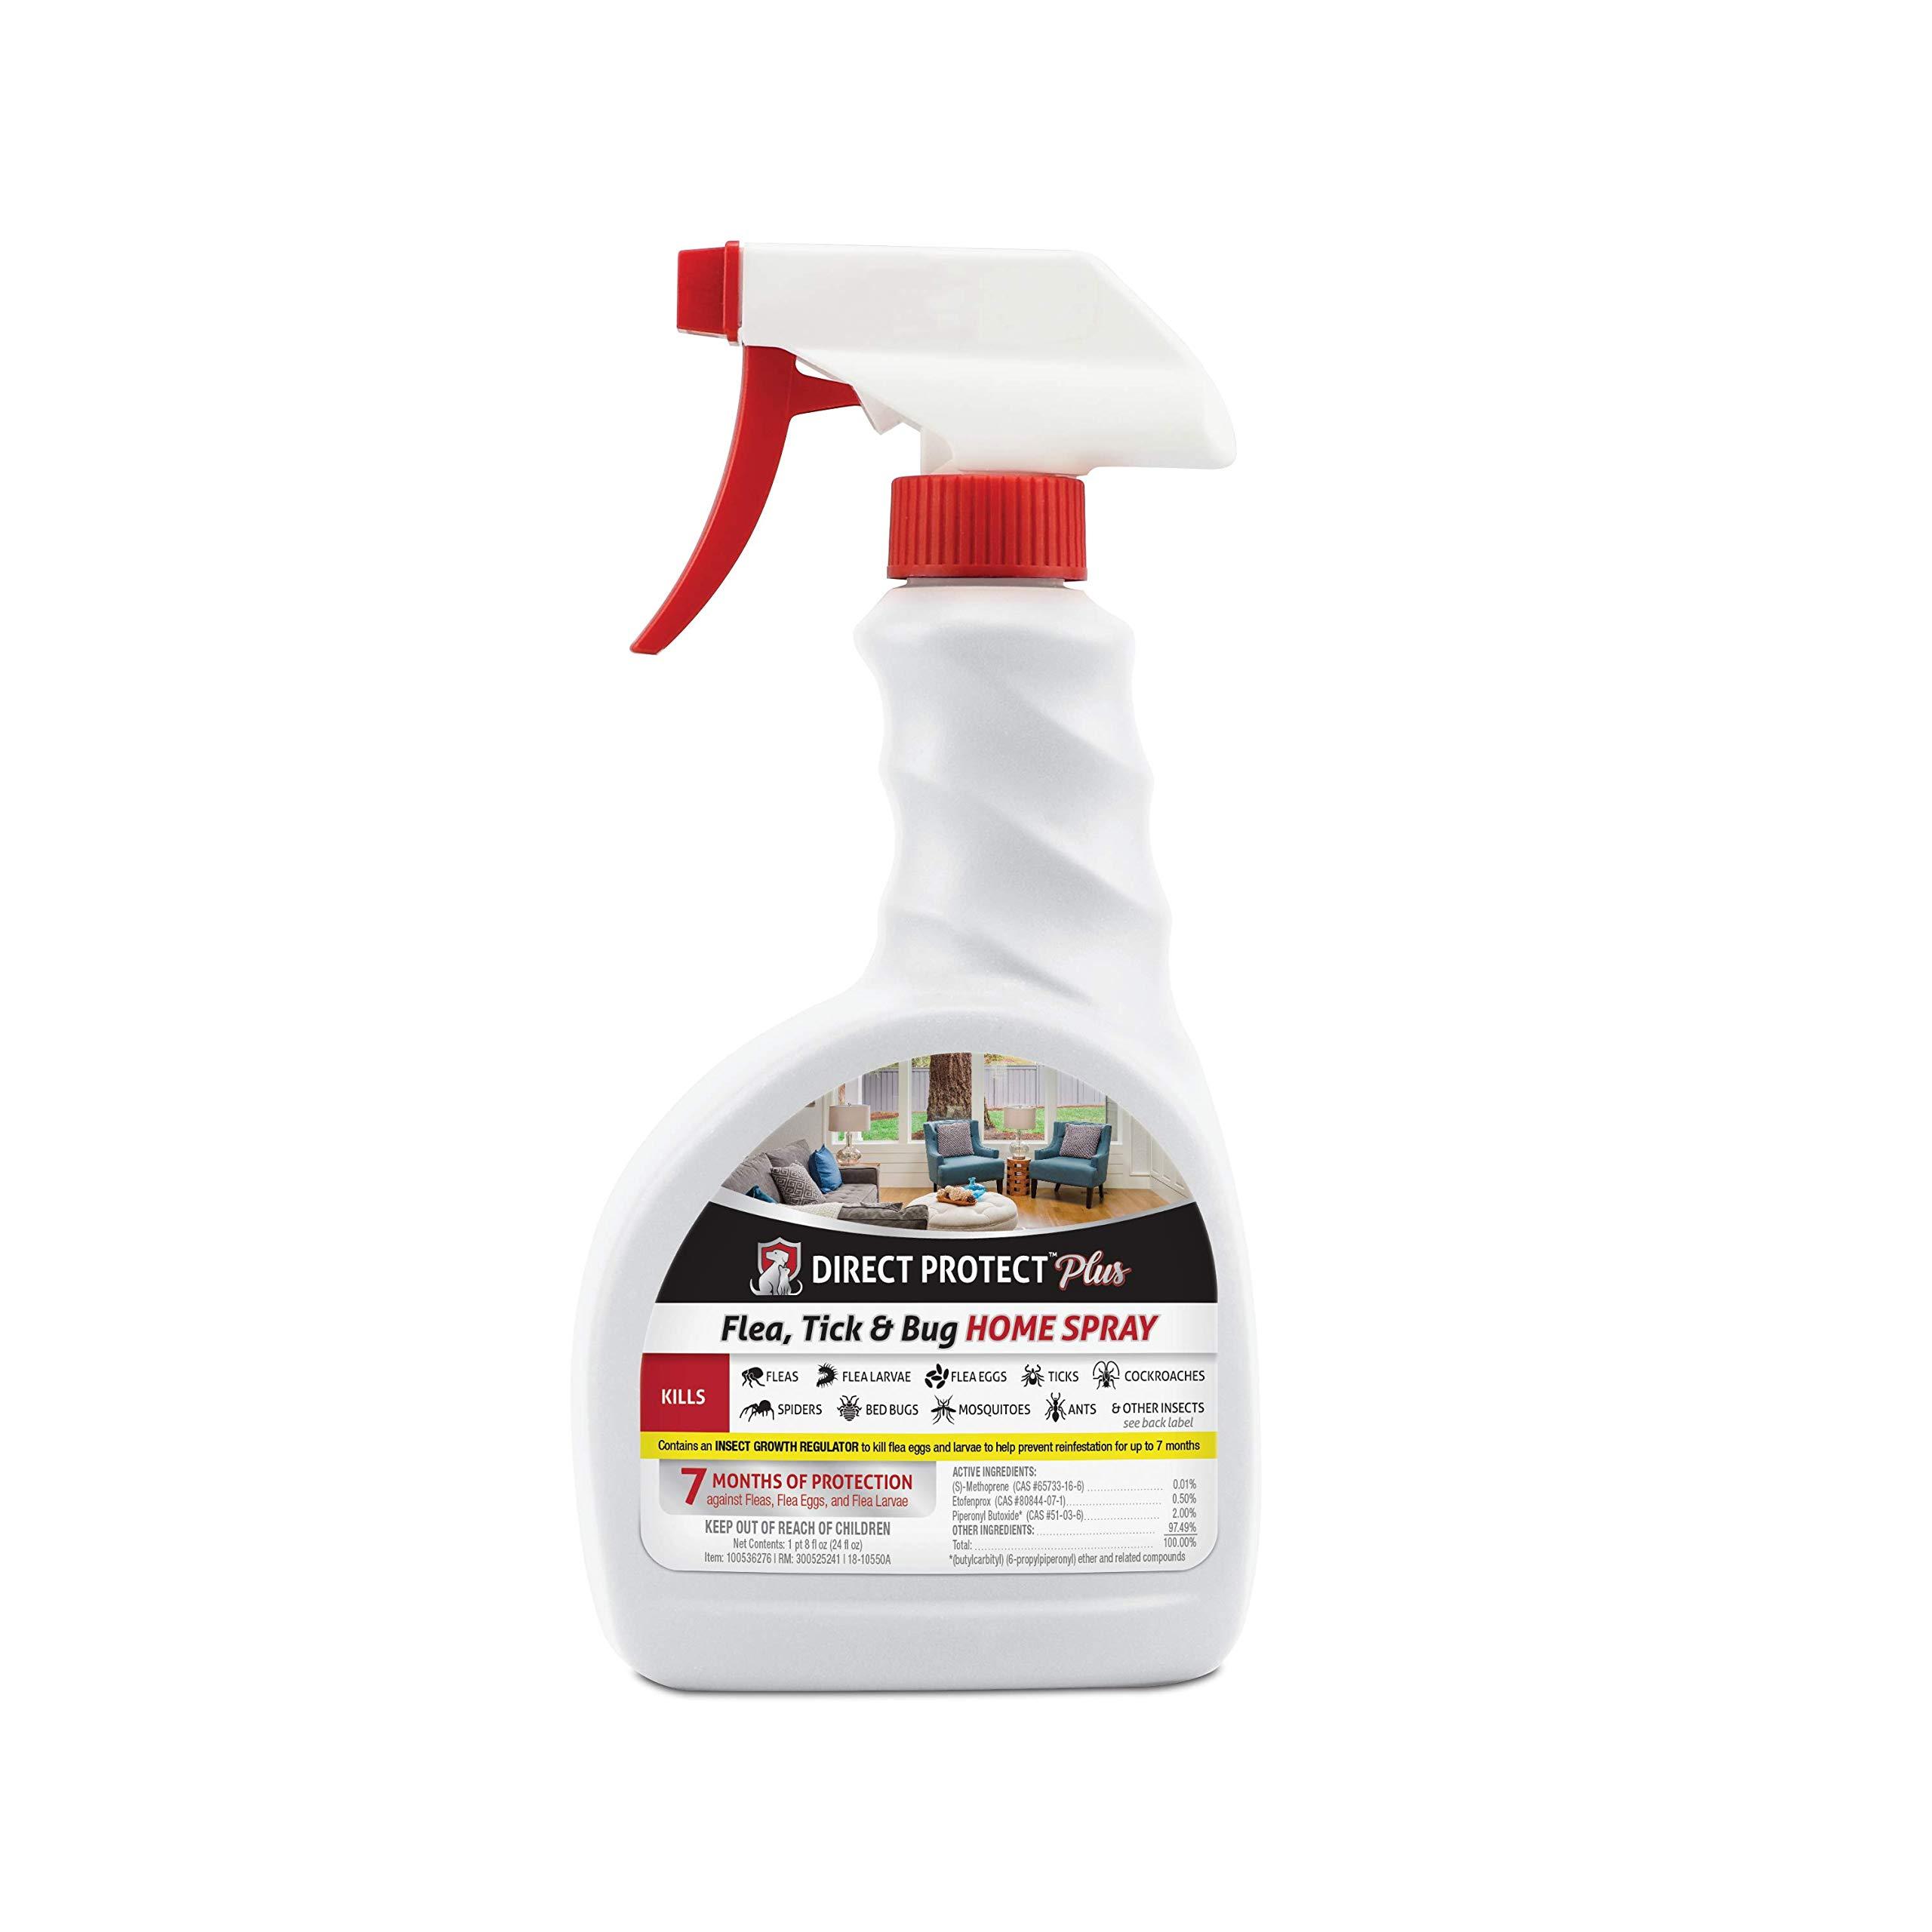 Direct Protect Plus Flea & Tick Home Spray - 24 oz